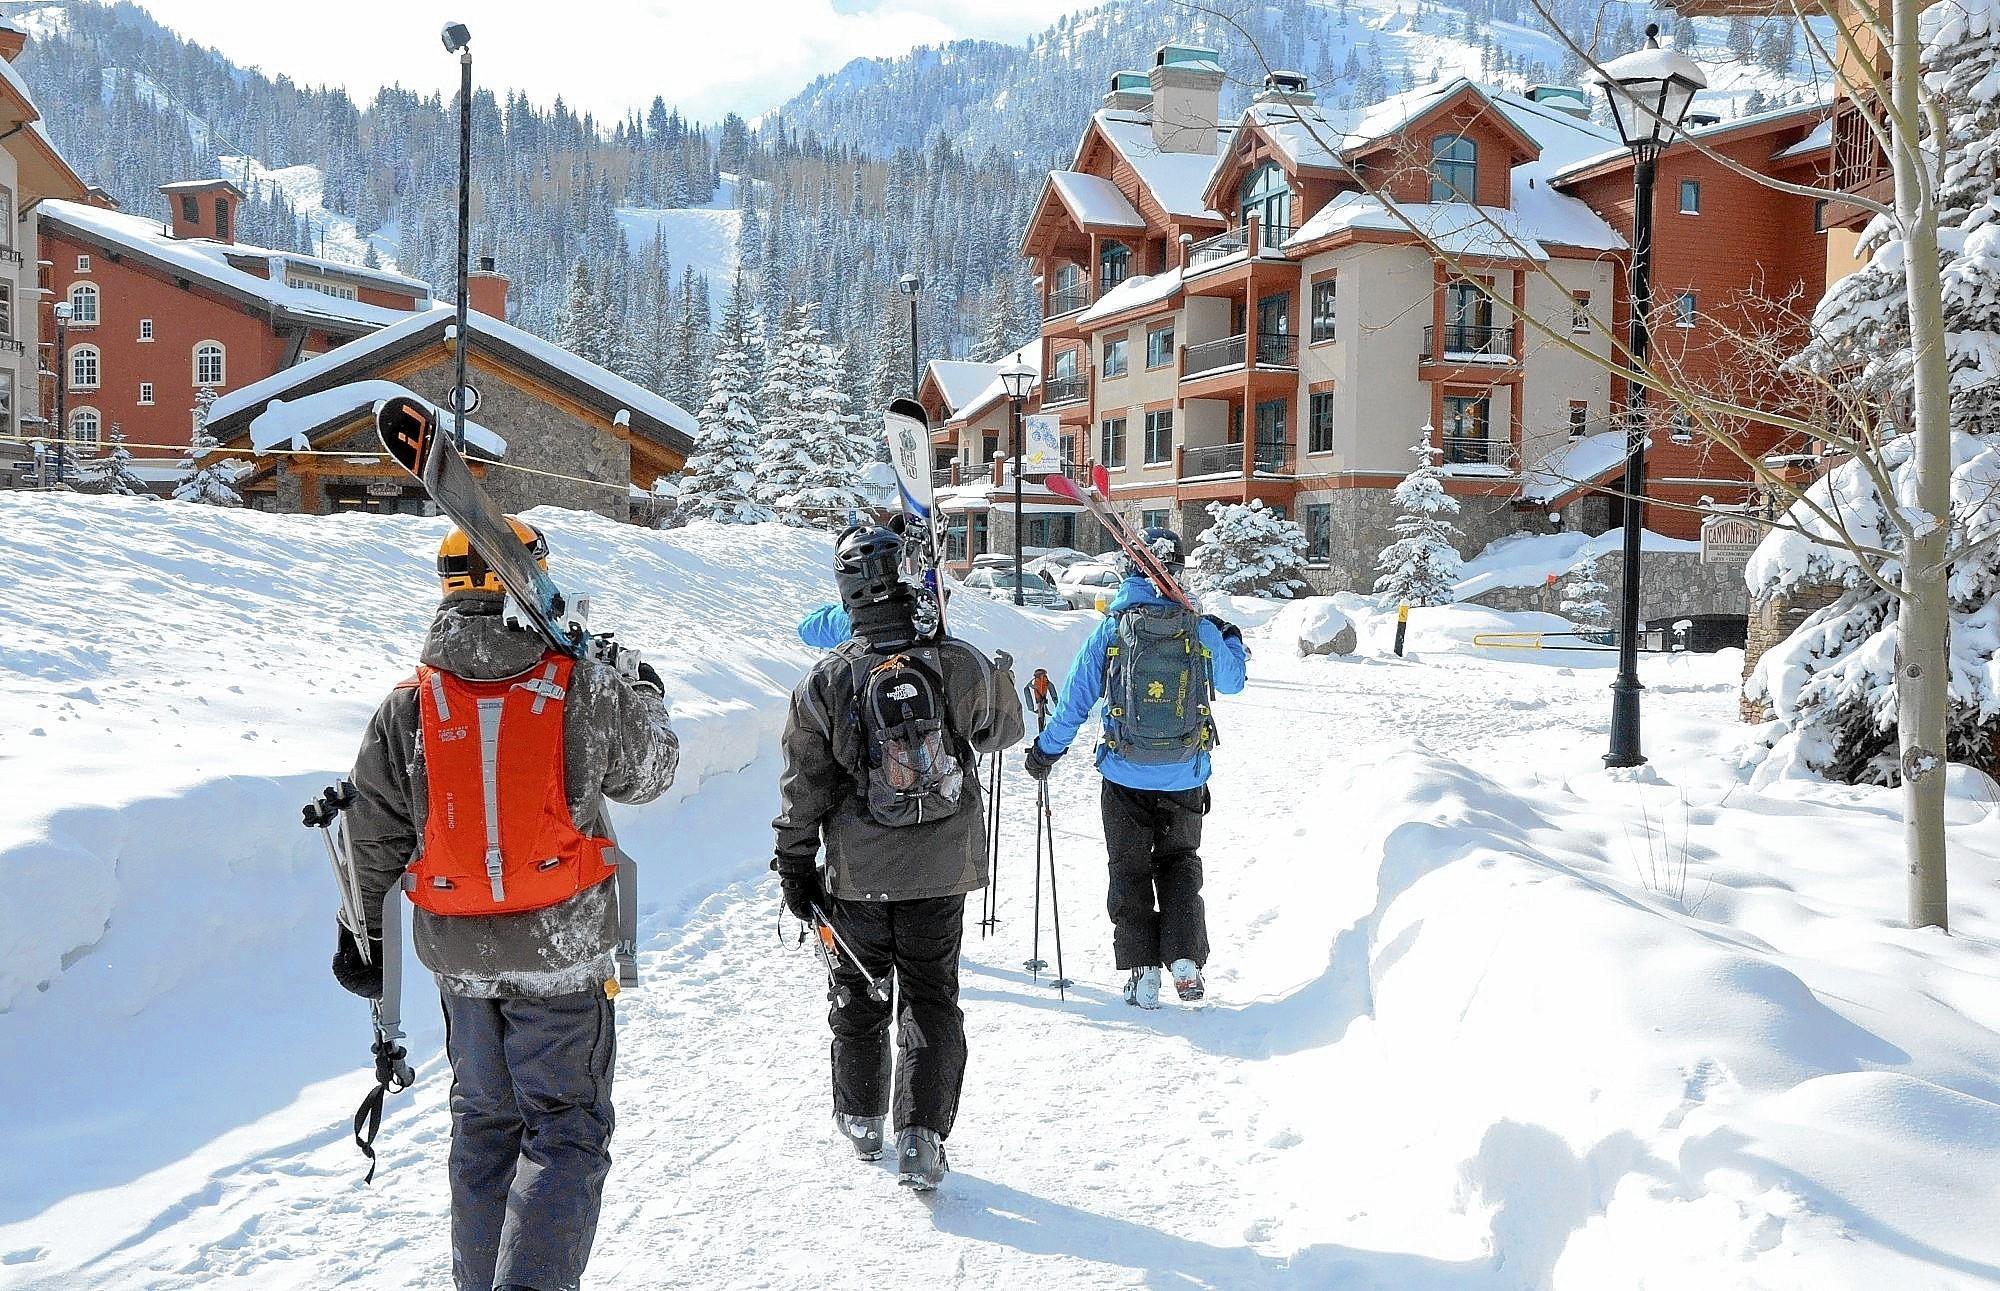 interconnect helps you navigate utah's best ski resorts - latimes